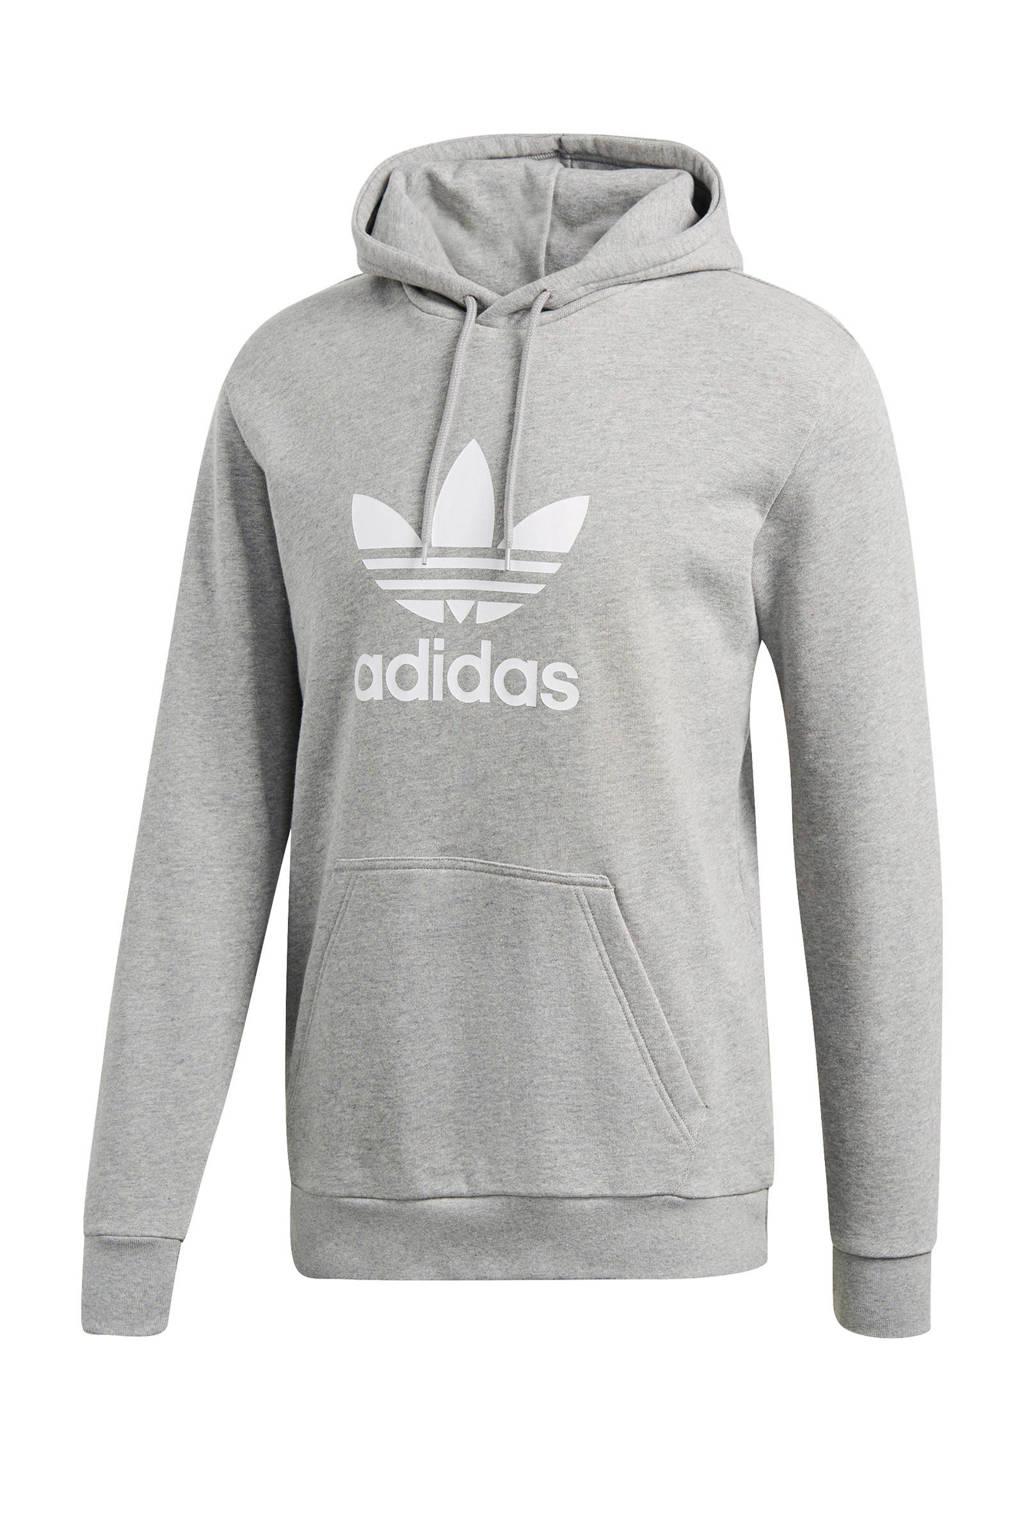 7672798cb61 adidas originals hoodie lichtgrijs, Lichtgrijs